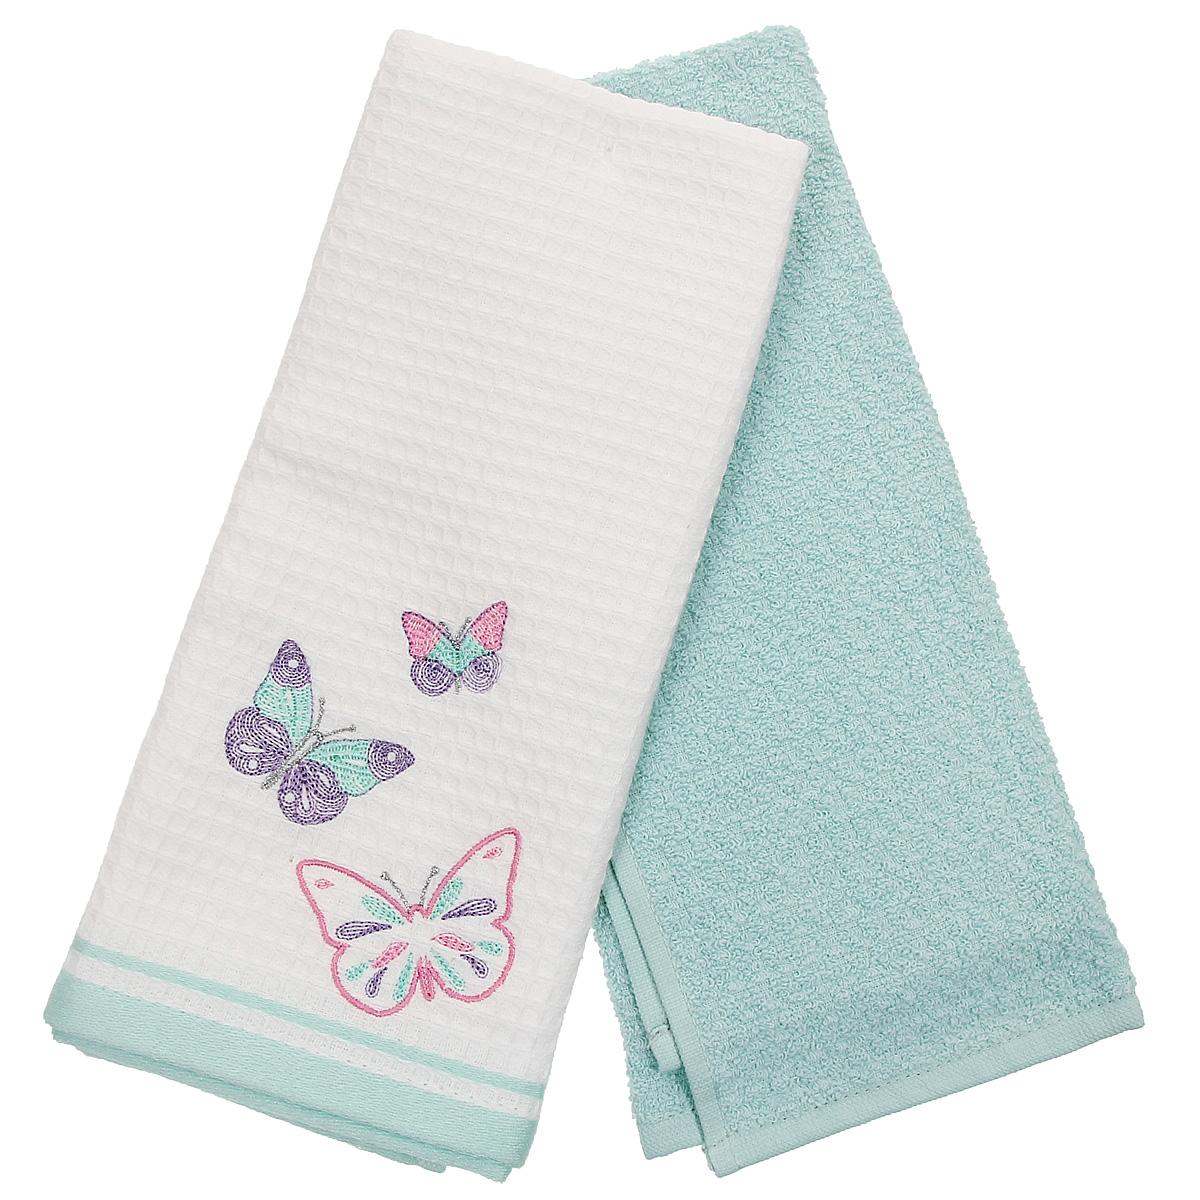 "Набор кухонных полотенец Coronet ""Бабочки"", цвет: белый, бирюзовый, 40 х 60 см, 2 шт"